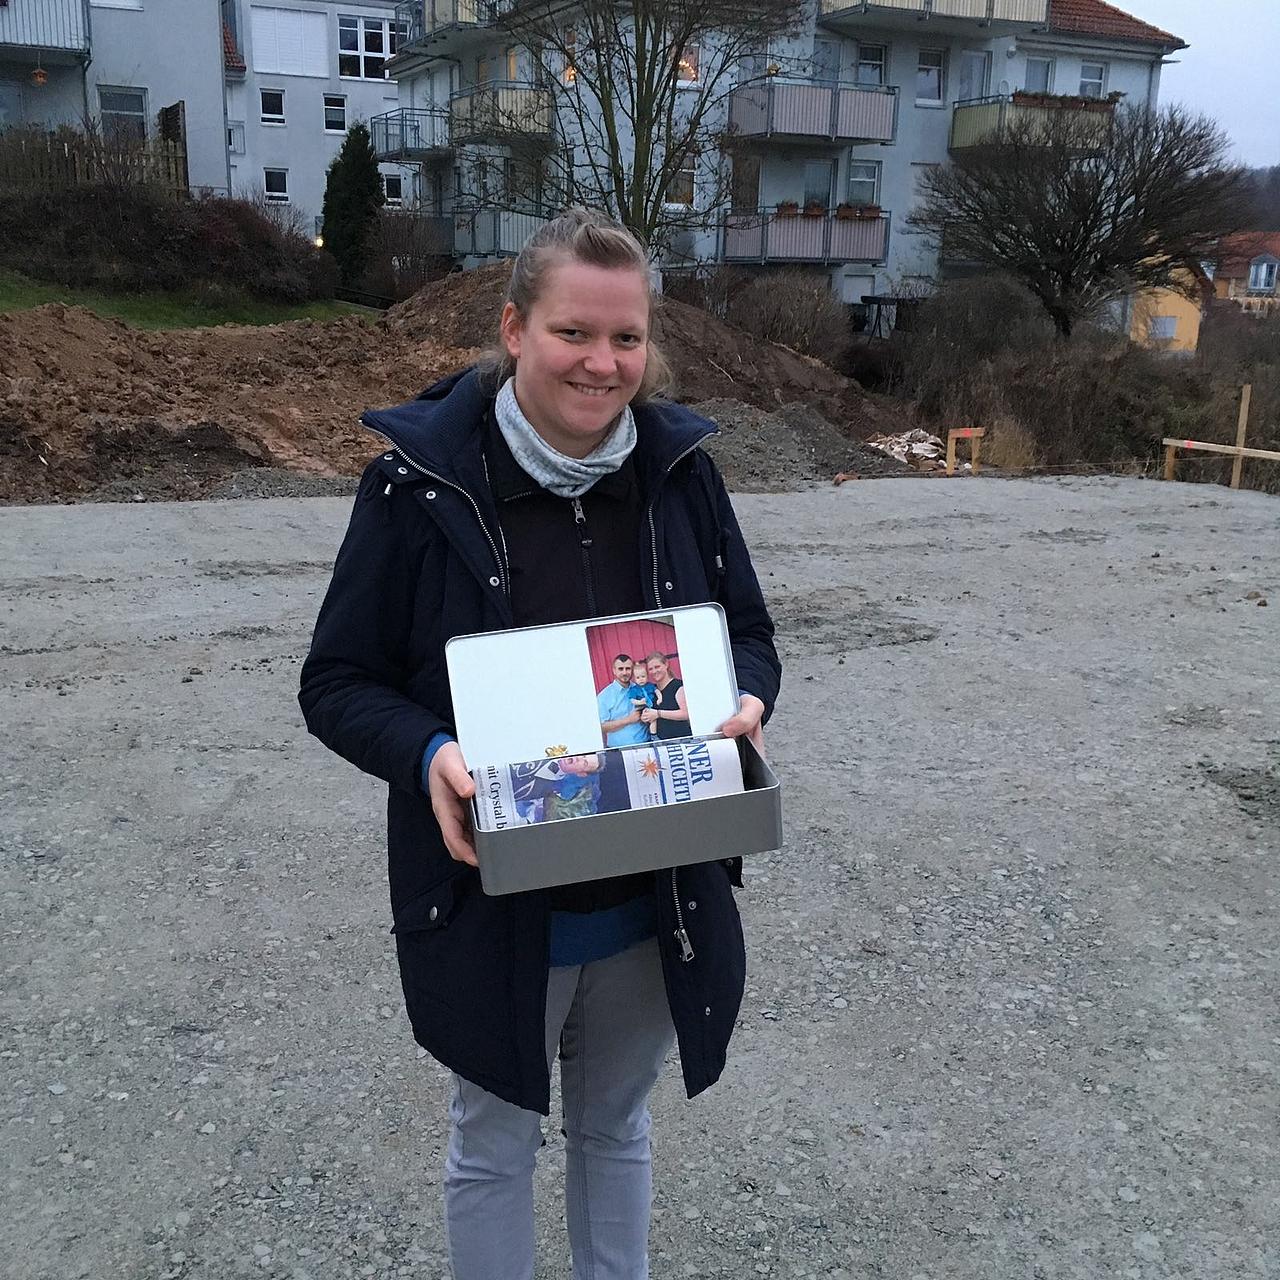 Kern Haus Dresden: Freital: Hier Wird Familie Groß Geschrieben